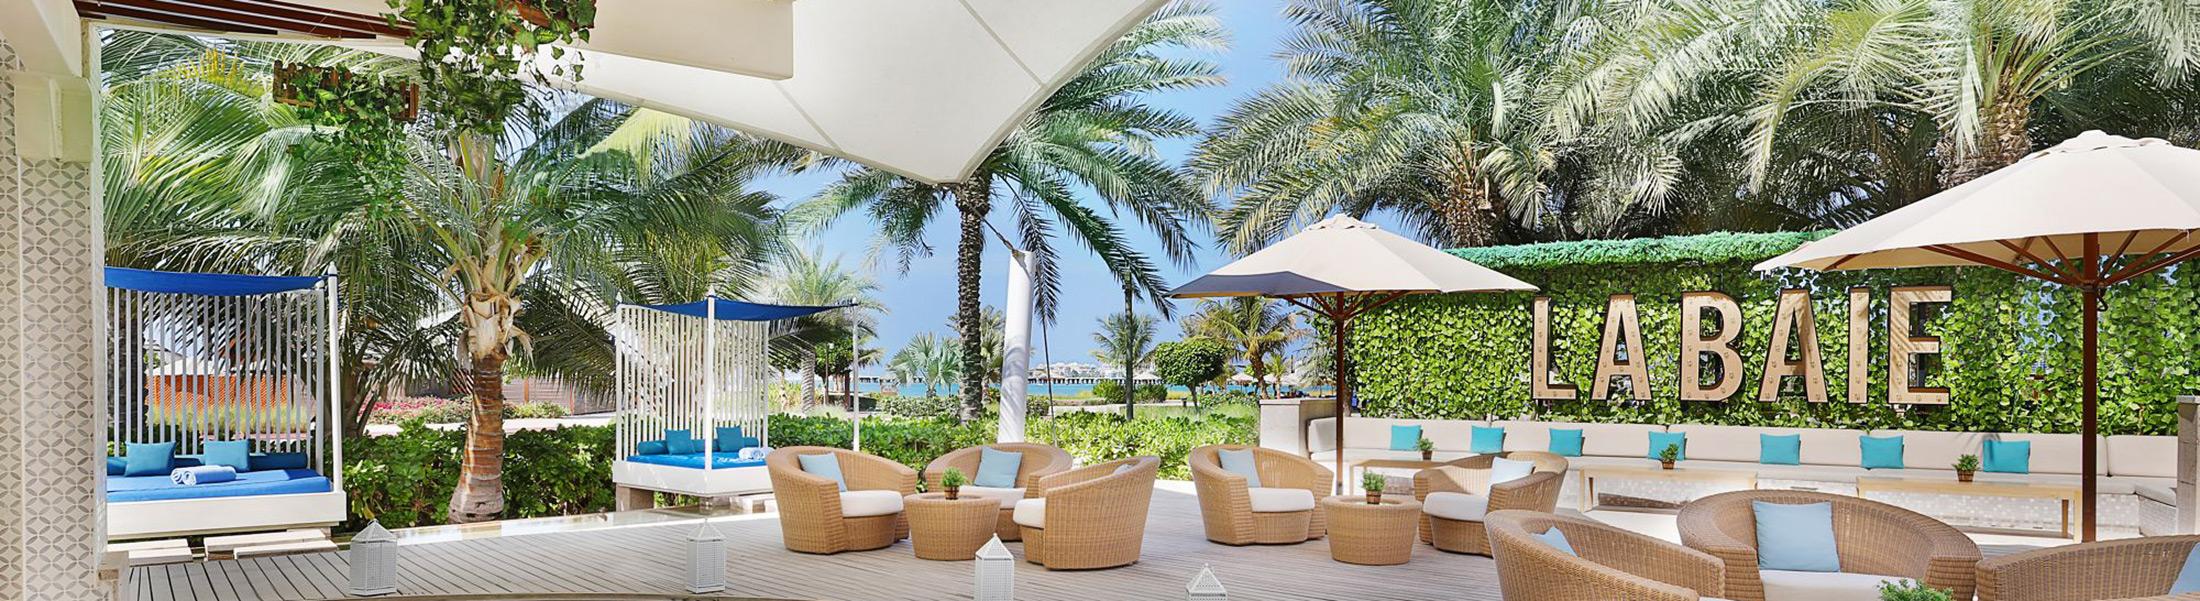 Poolside dining at La Baie at Ritz-Carlton Dubai